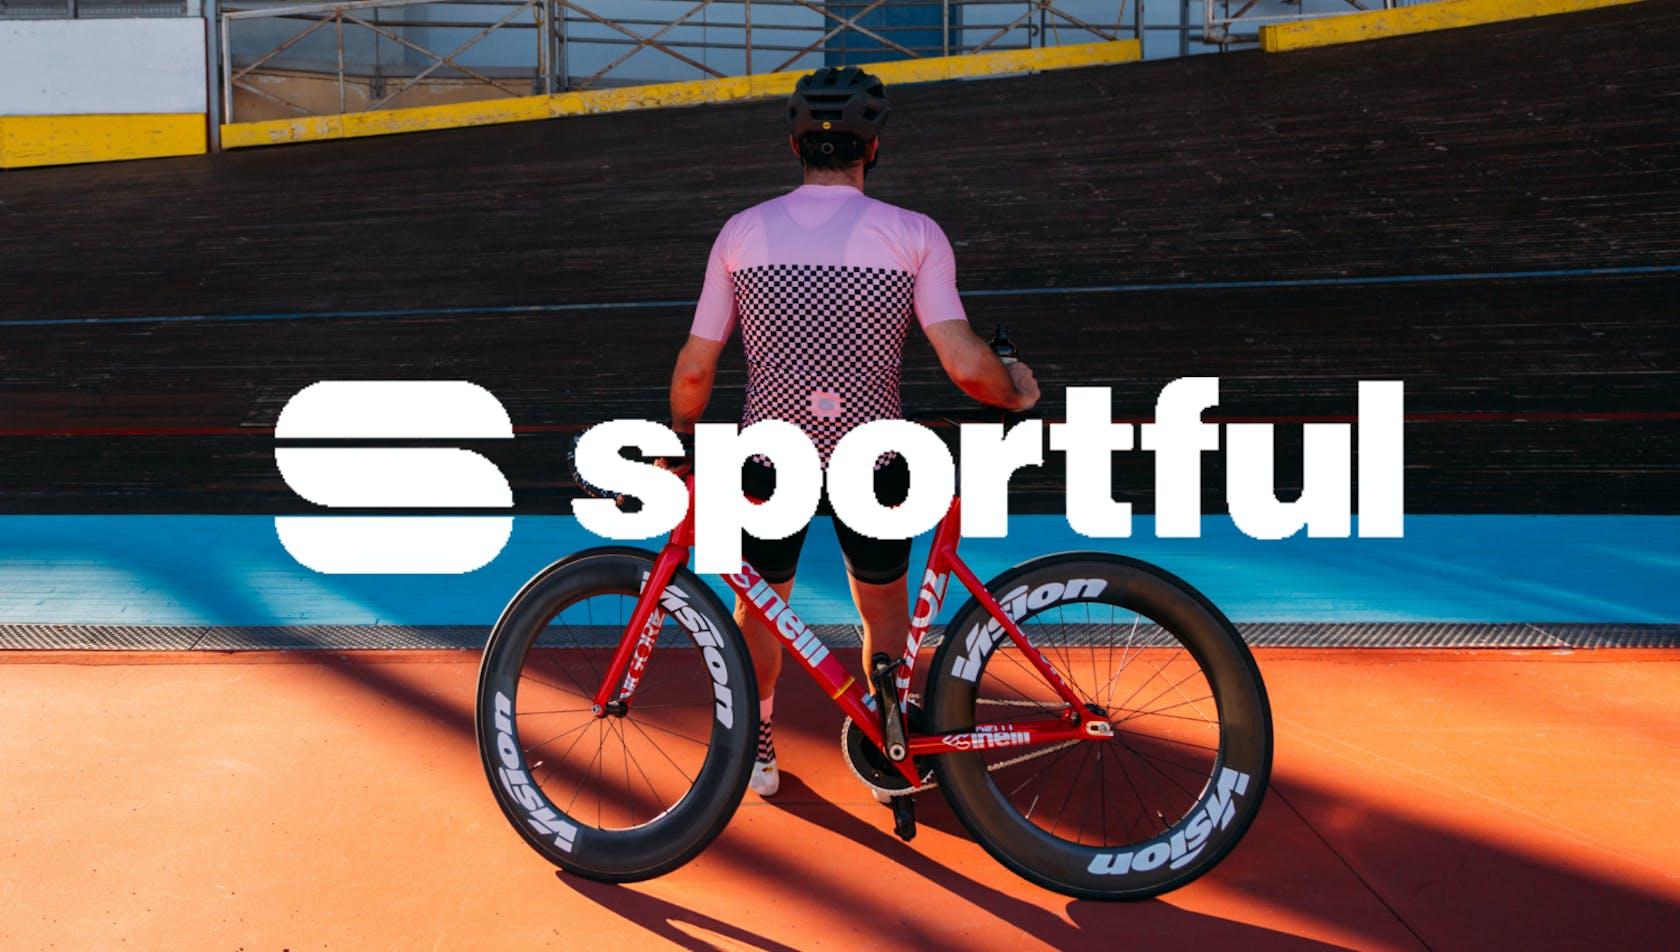 Sportful Bikes